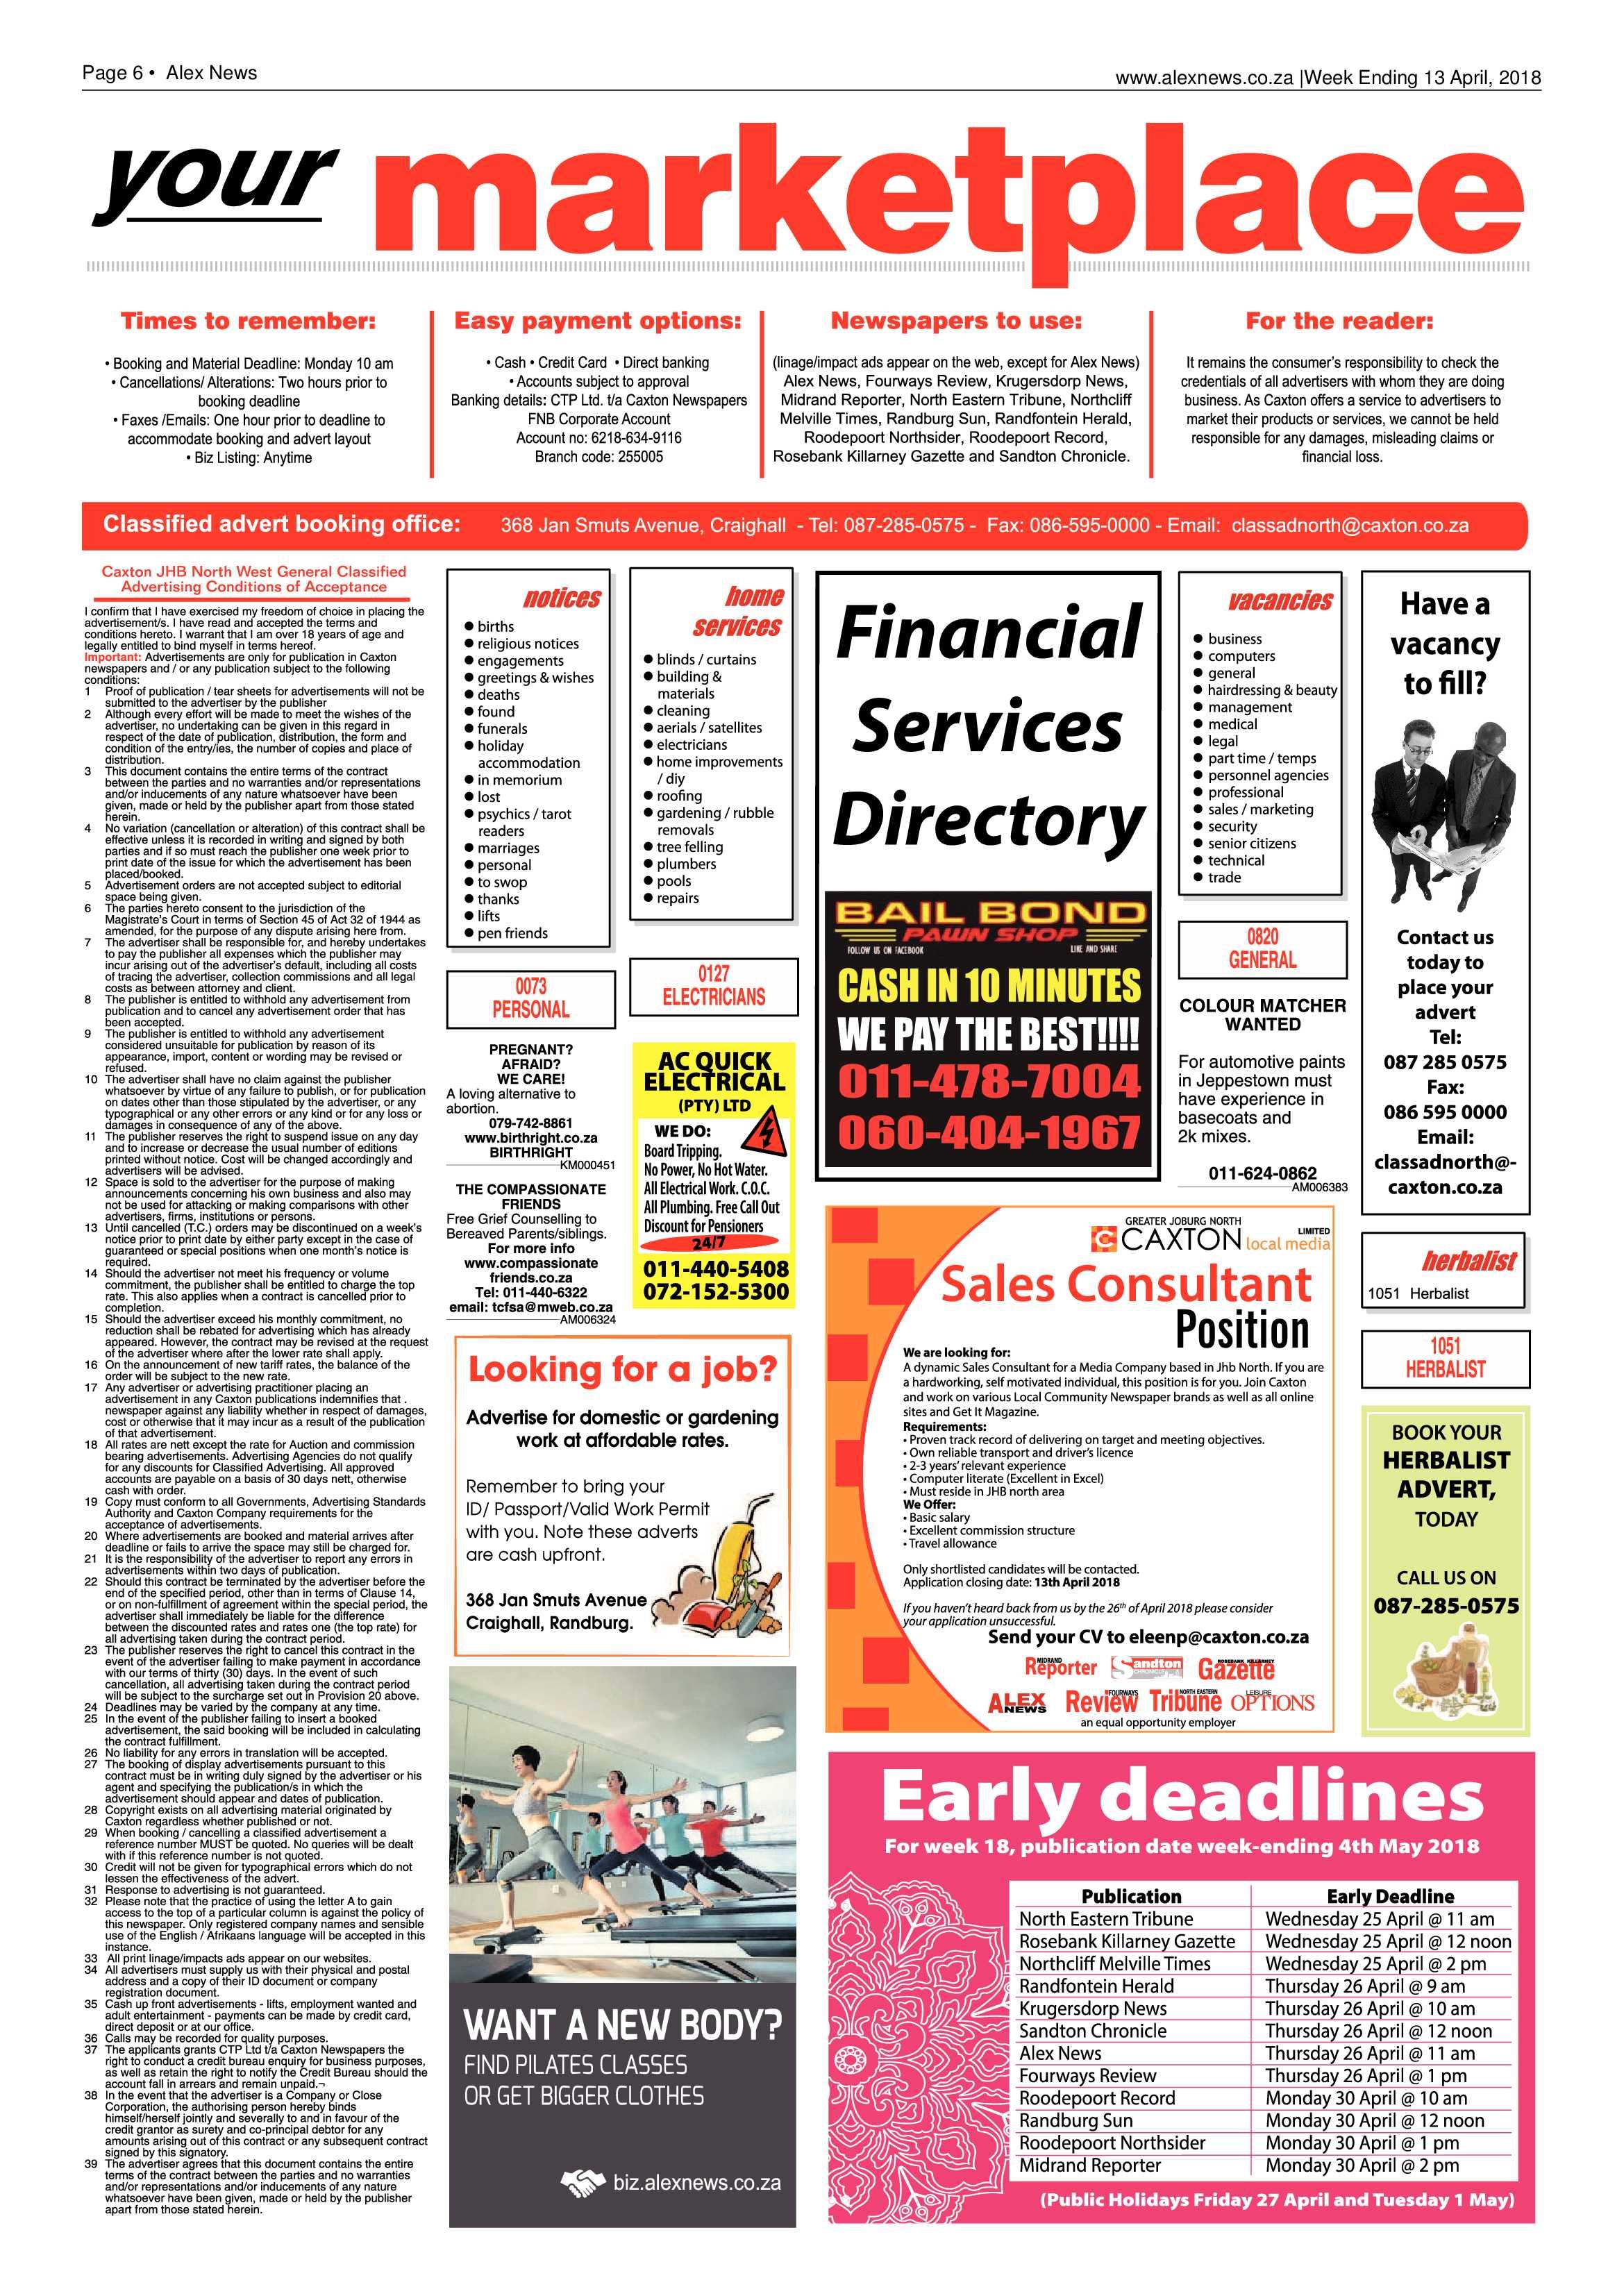 alex-news-13-april-2018-epapers-page-6